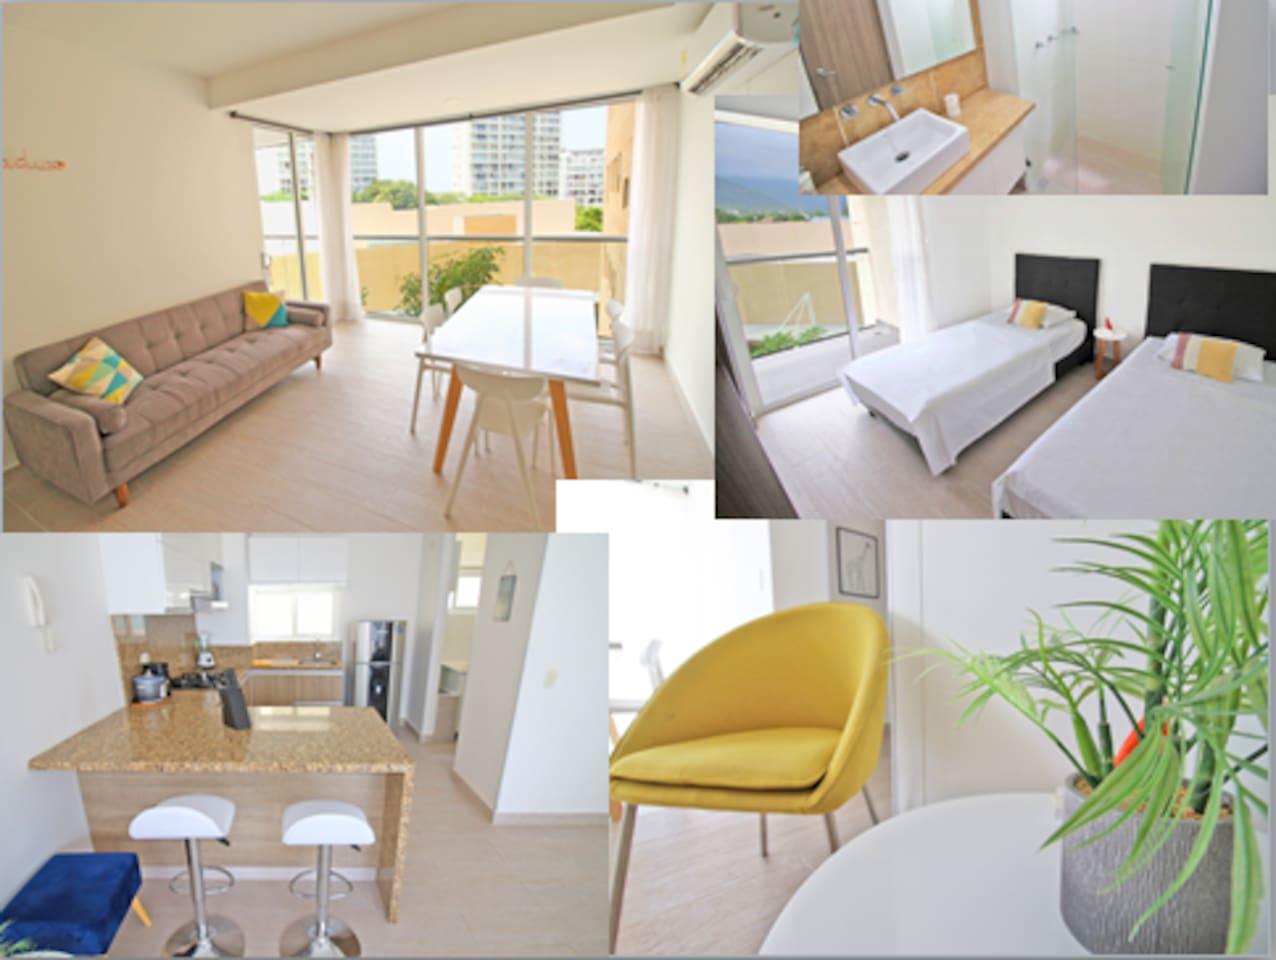 Apartamento completamente dotado para 7 personas